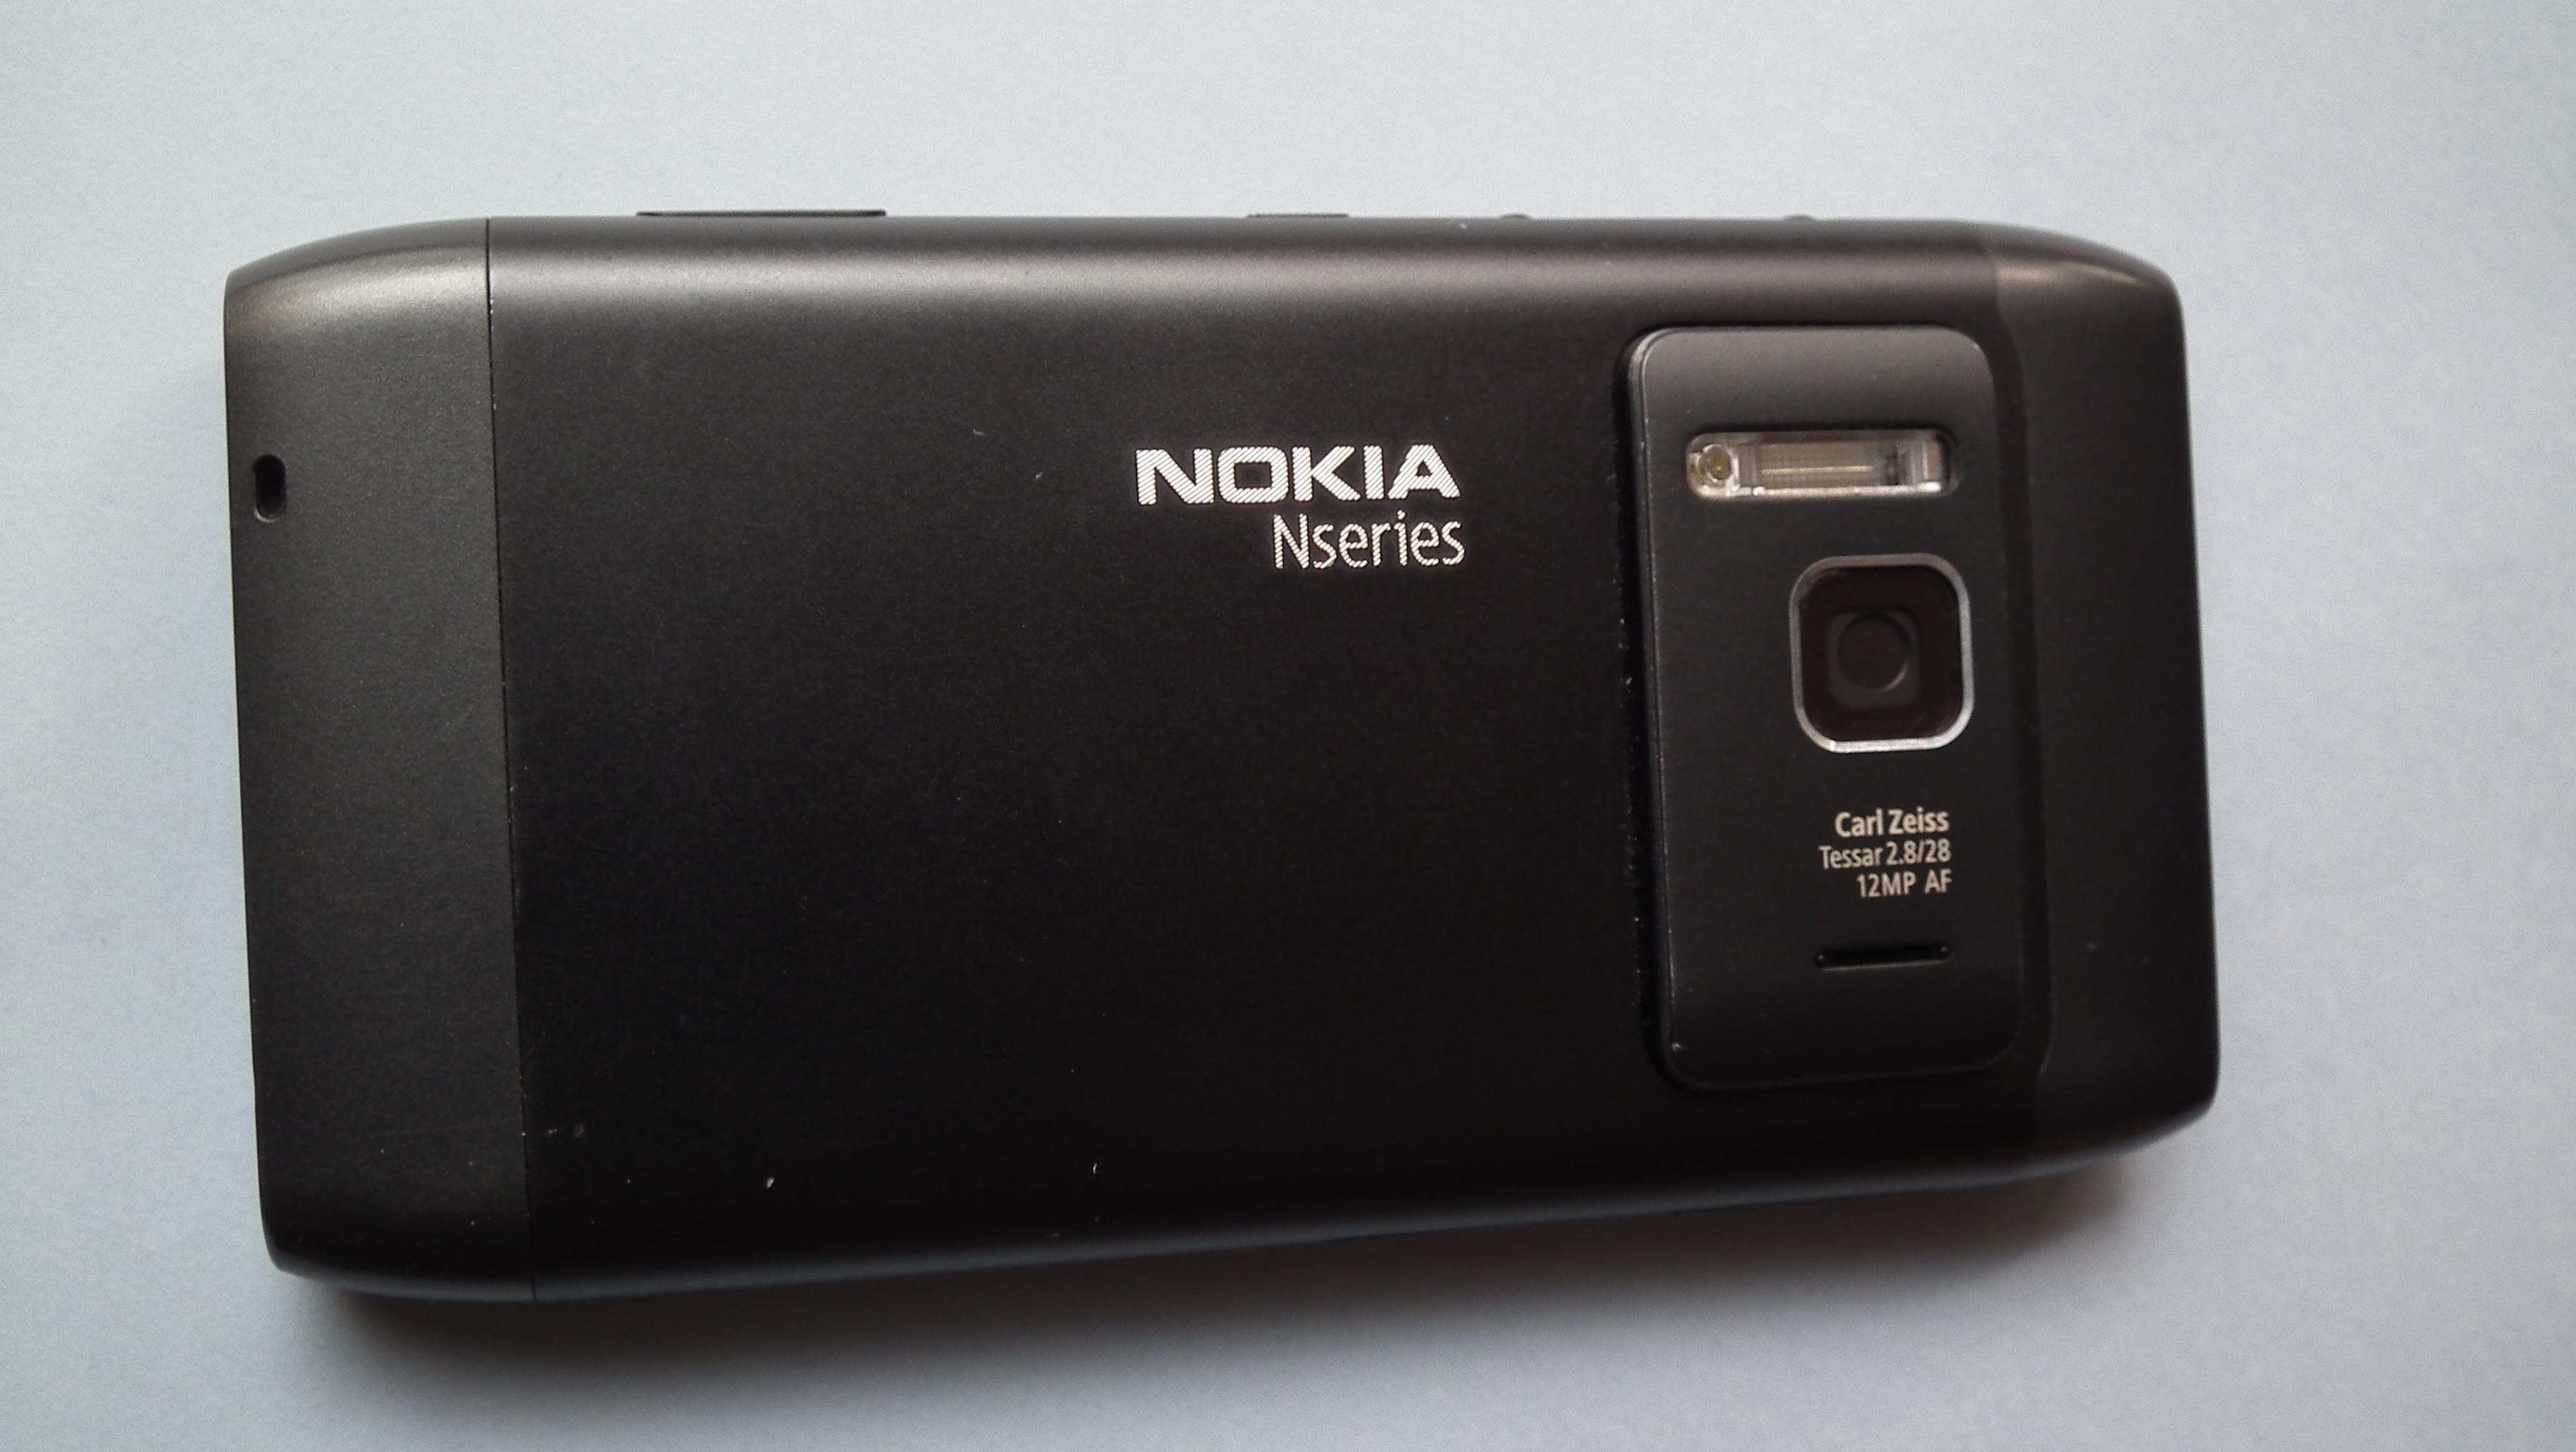 File:Nokia N8 Mobile 7620.JPG - Wikimedia Commons